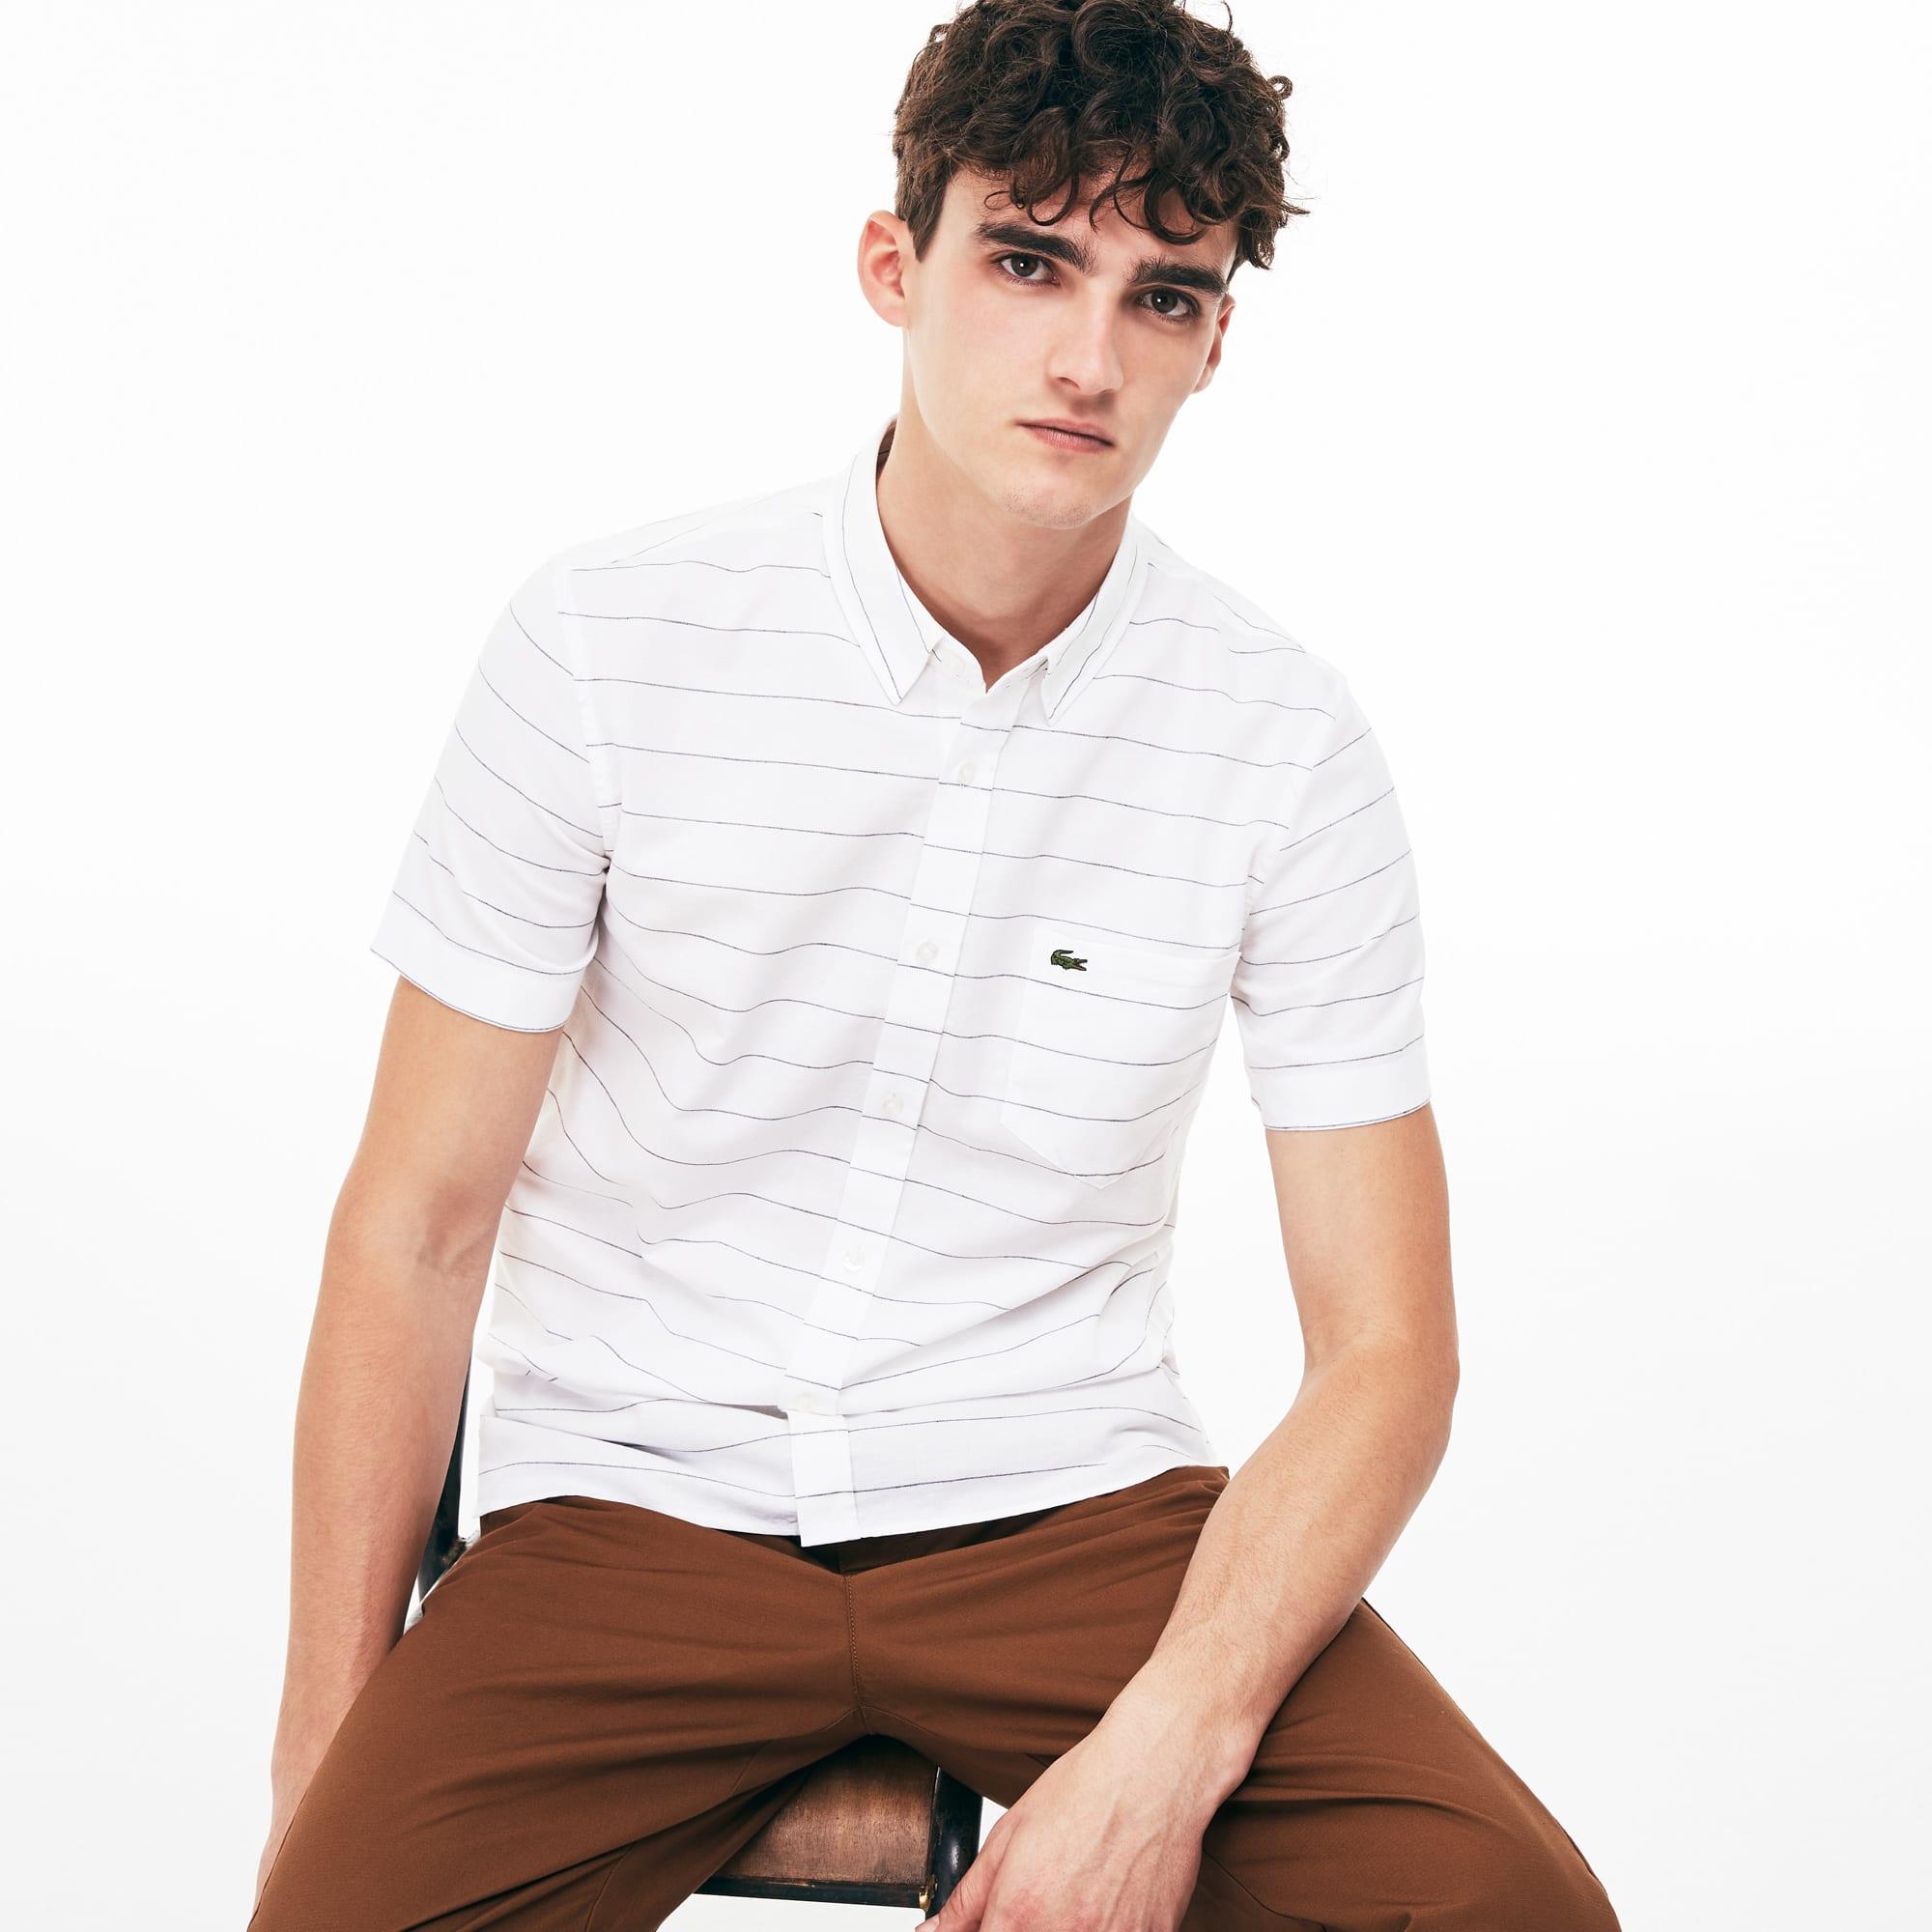 Men's Slim Fit Oxford Shirt